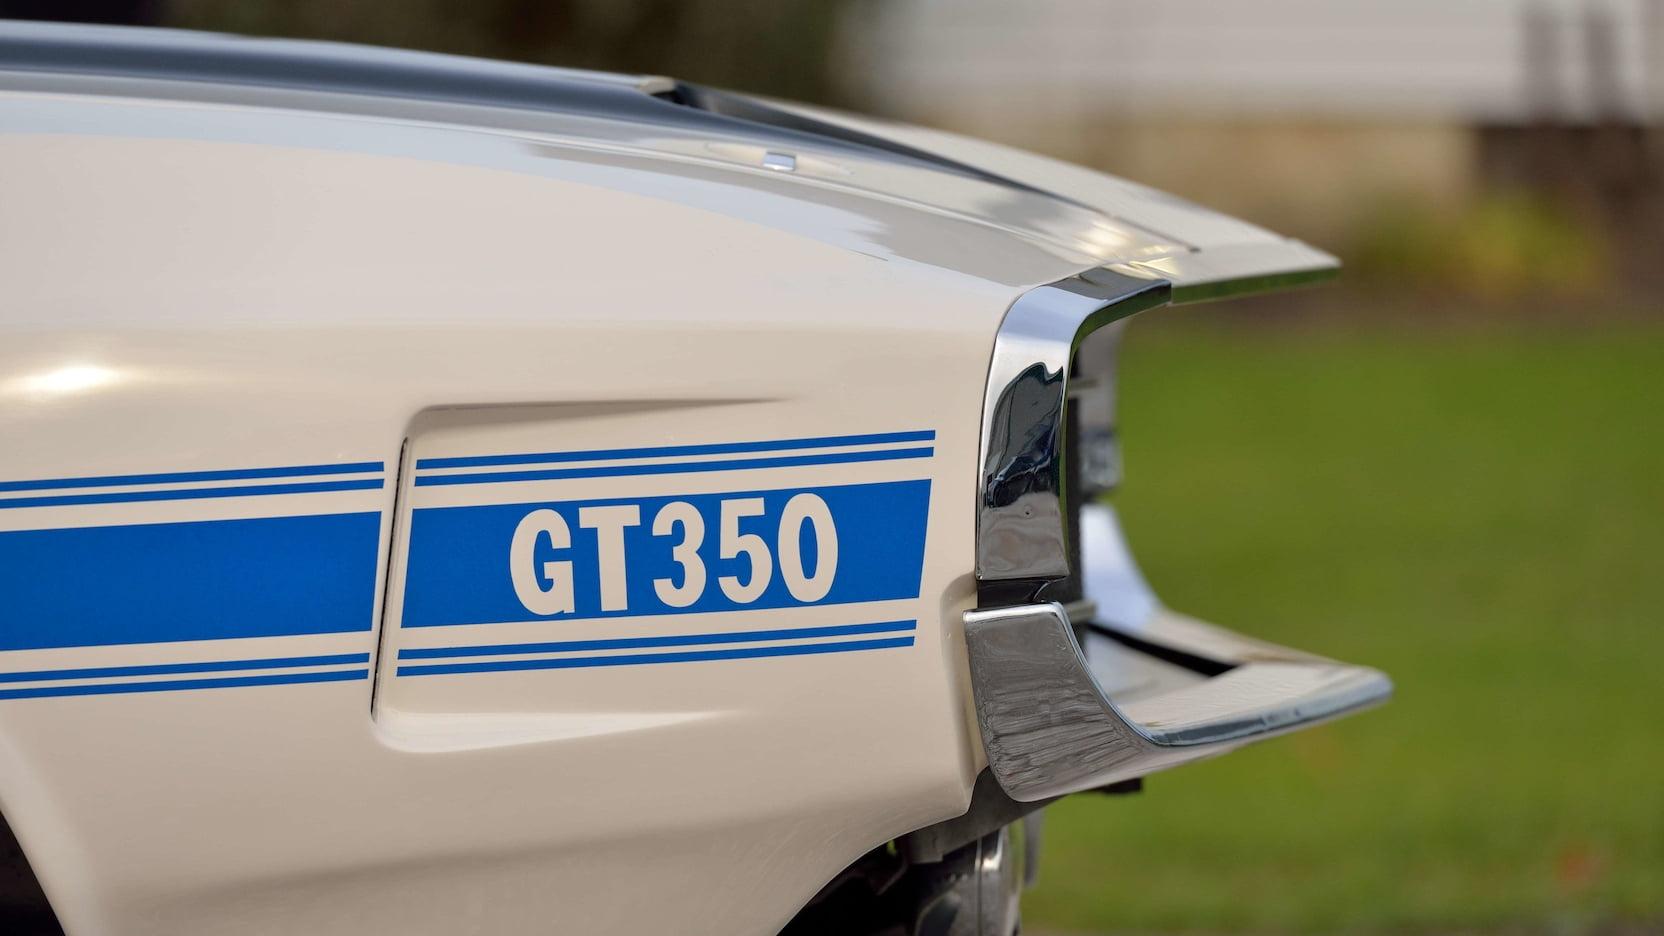 1970 Shelby GT350 fender logo